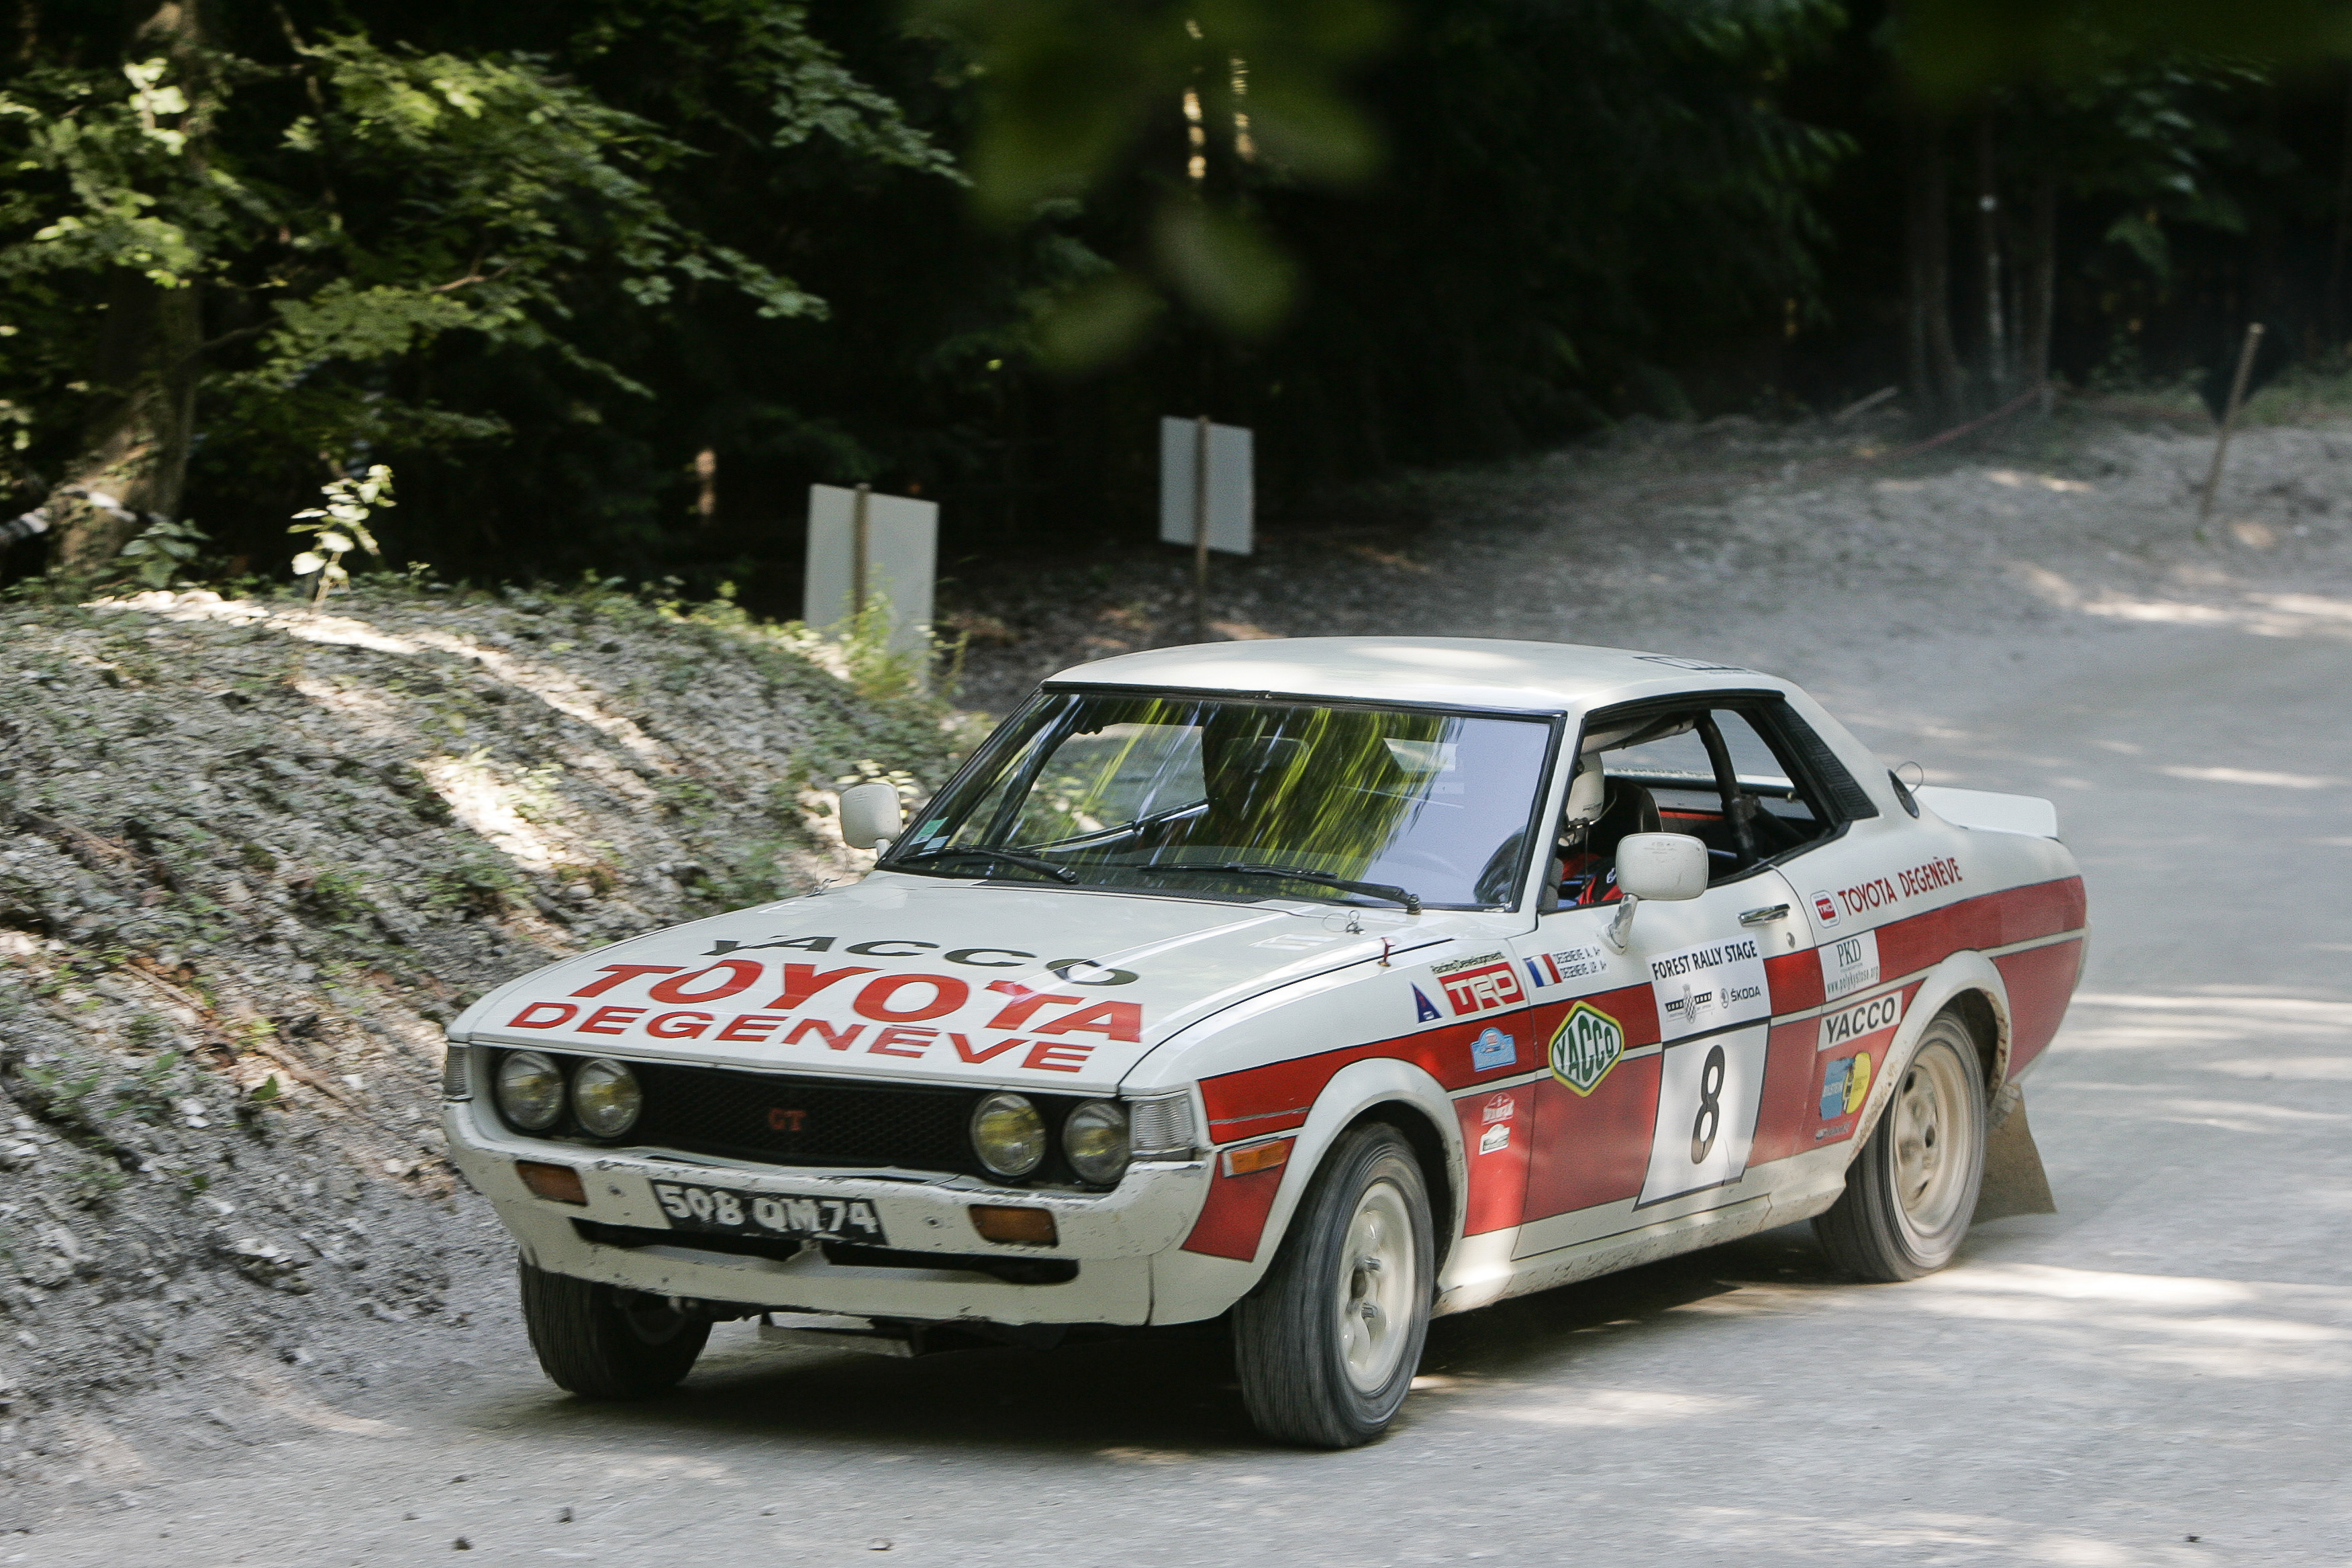 Vintage Toyota Celica rally | Toyota Celica | Pinterest | Toyota ...